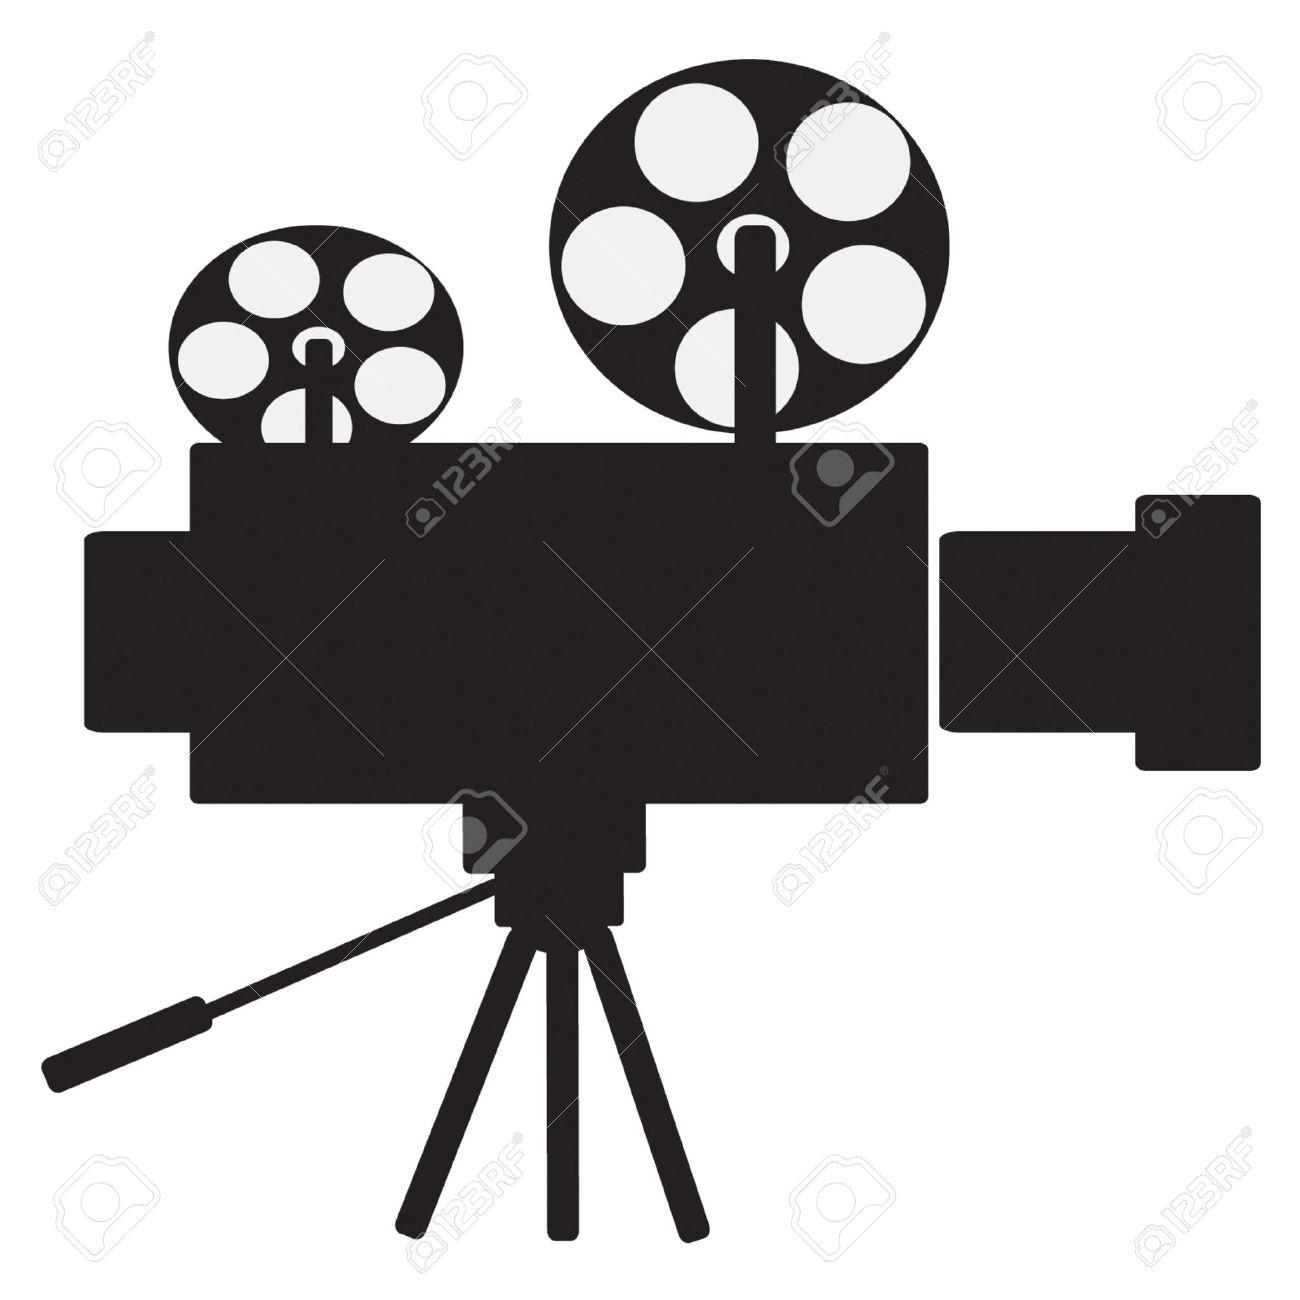 Film Projector Vector Clip Art Royalty Free Cliparts, Vectors, And.